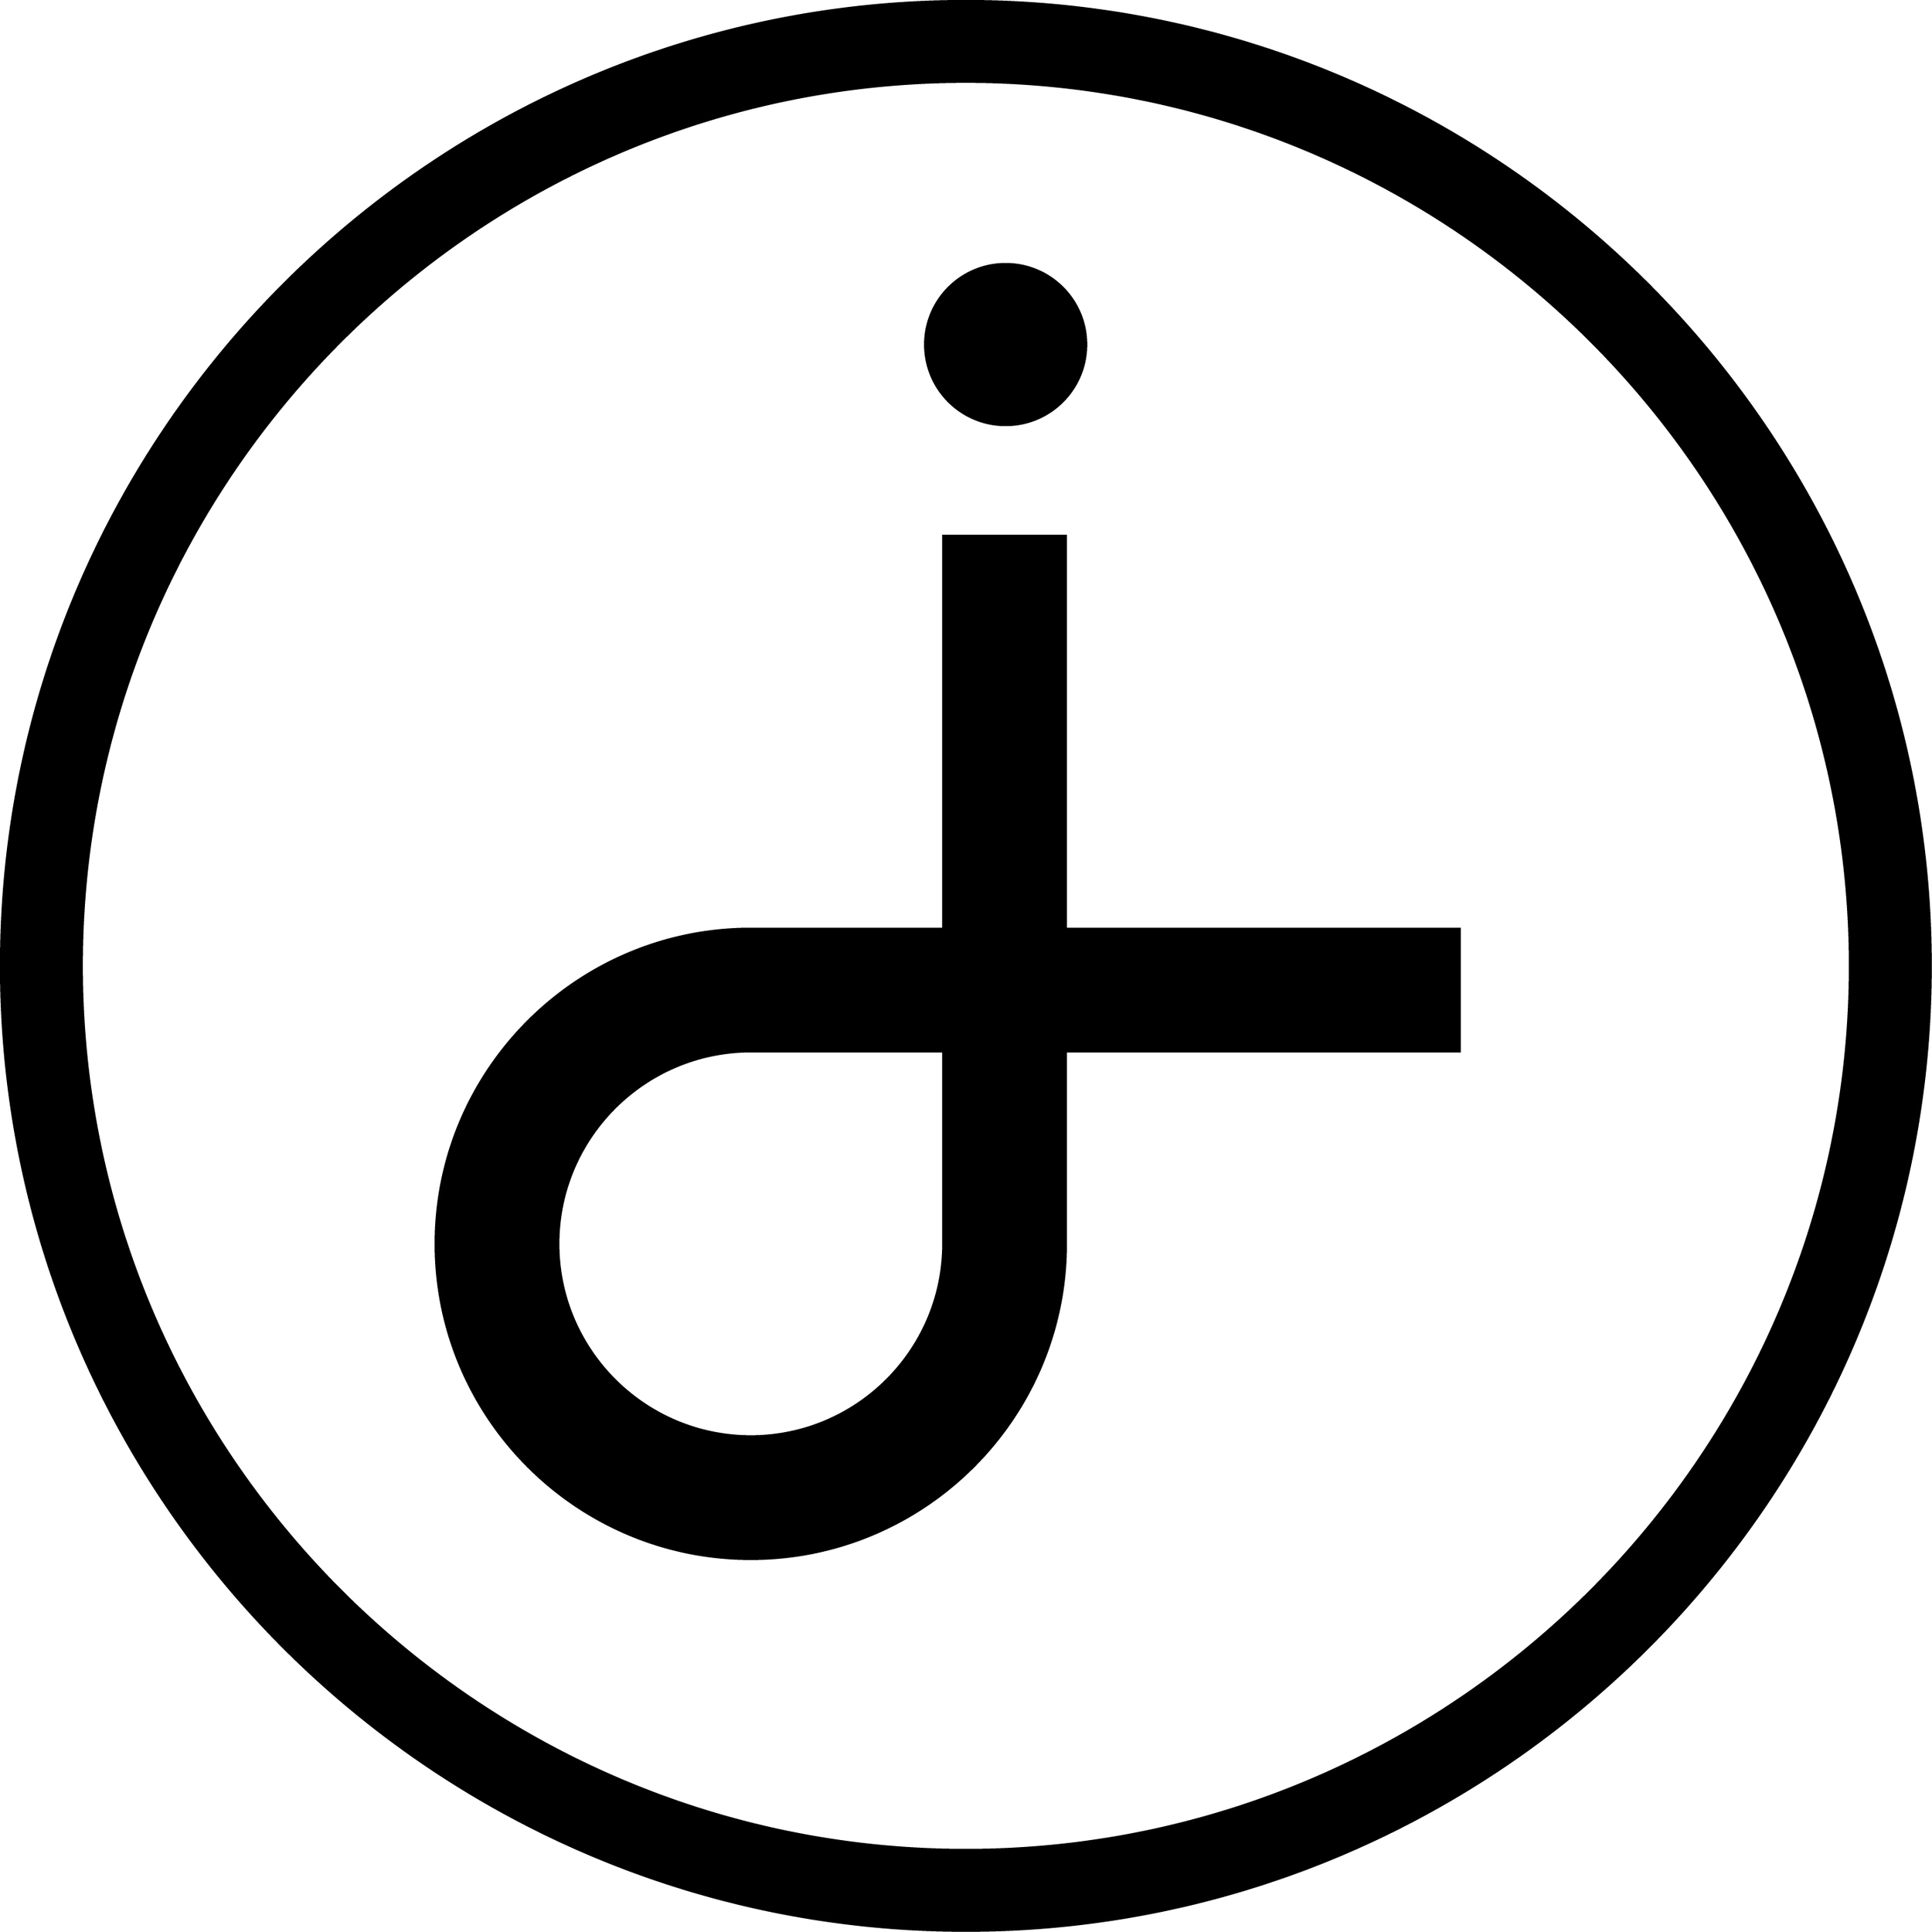 logo_white_small.jpg